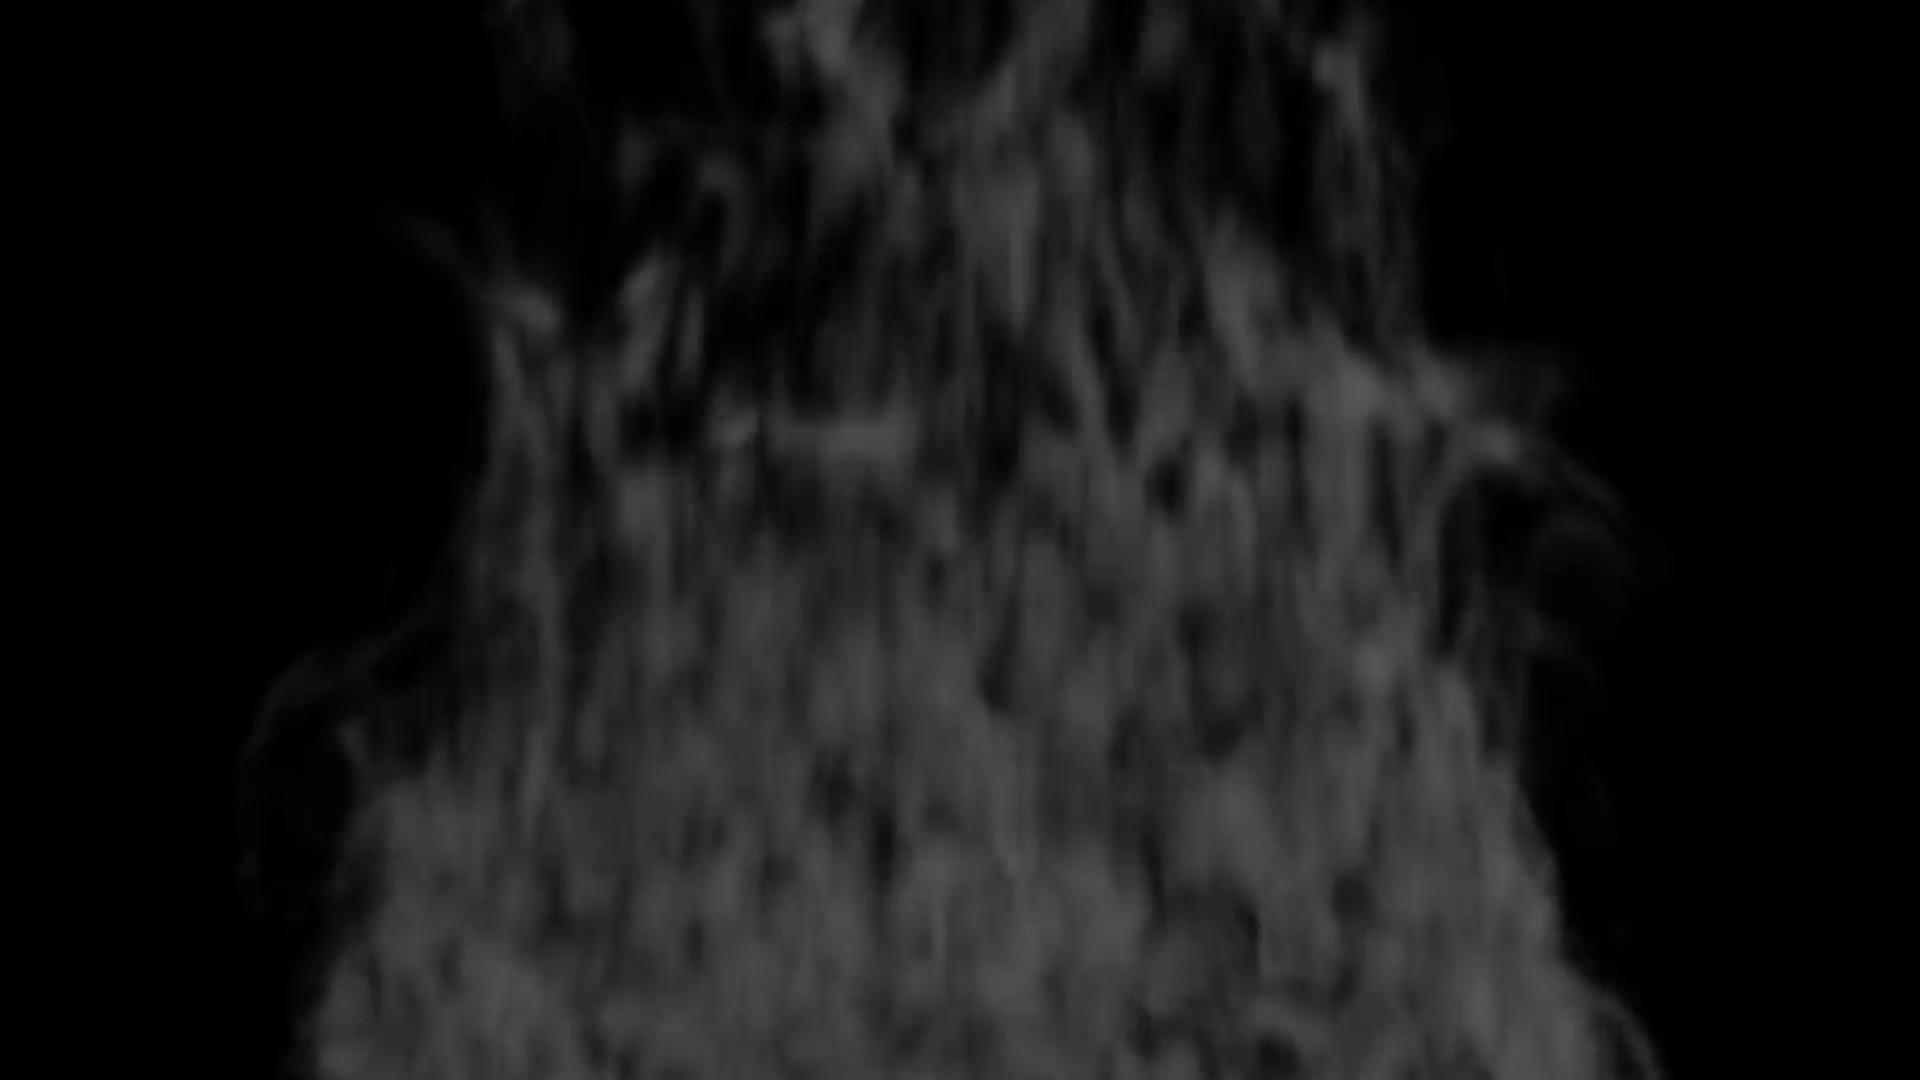 Animated realistic smoke on transparent background 4. Motion Background –  VideoBlocks